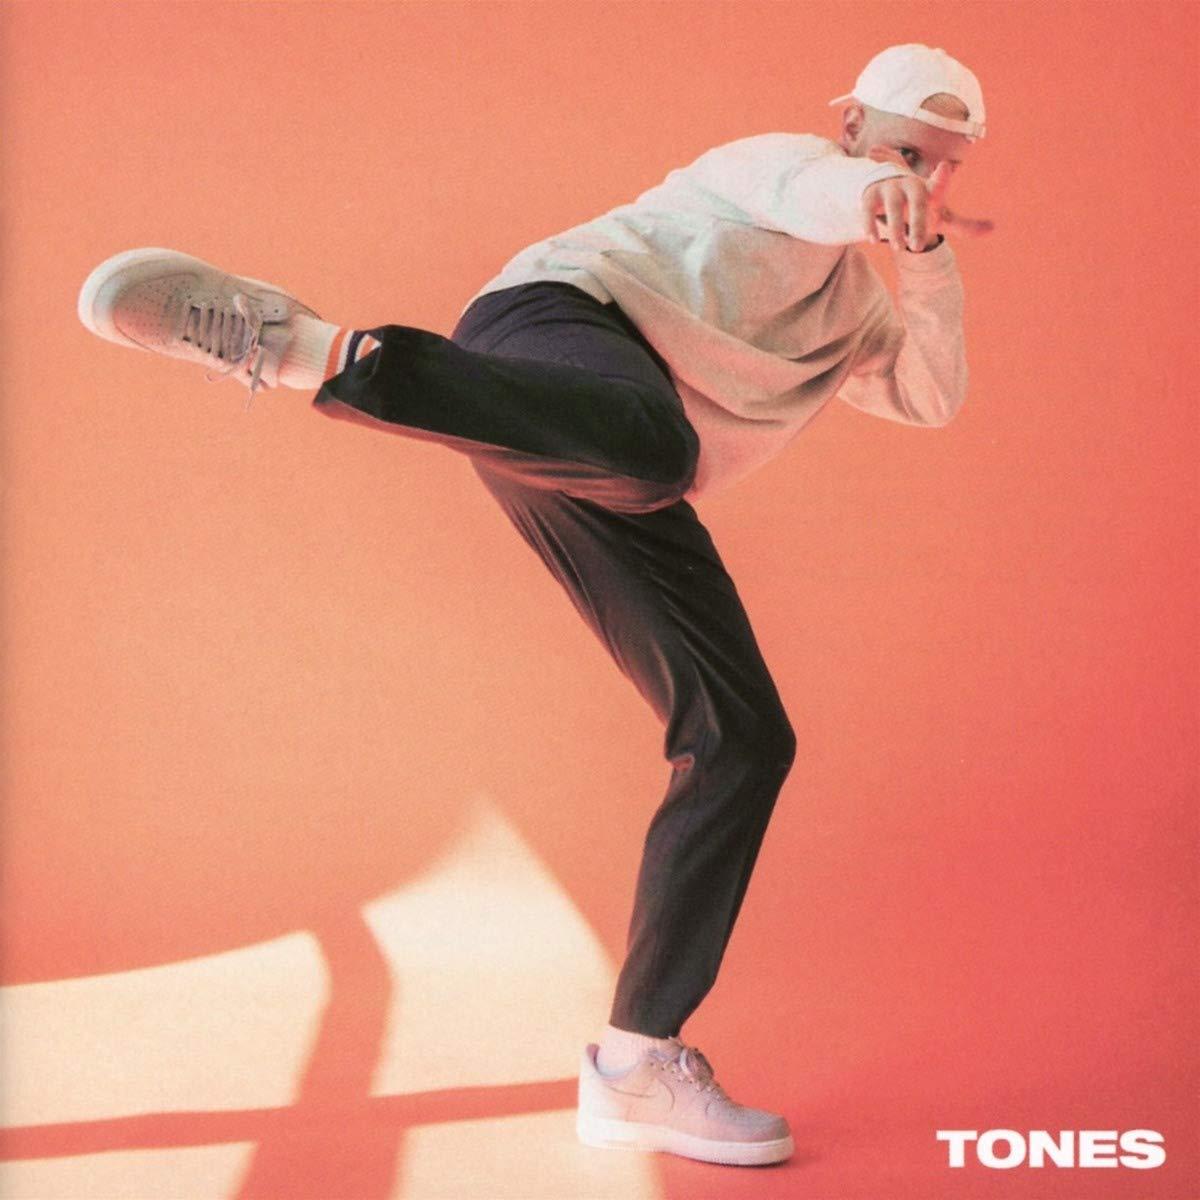 Teesy_Tones